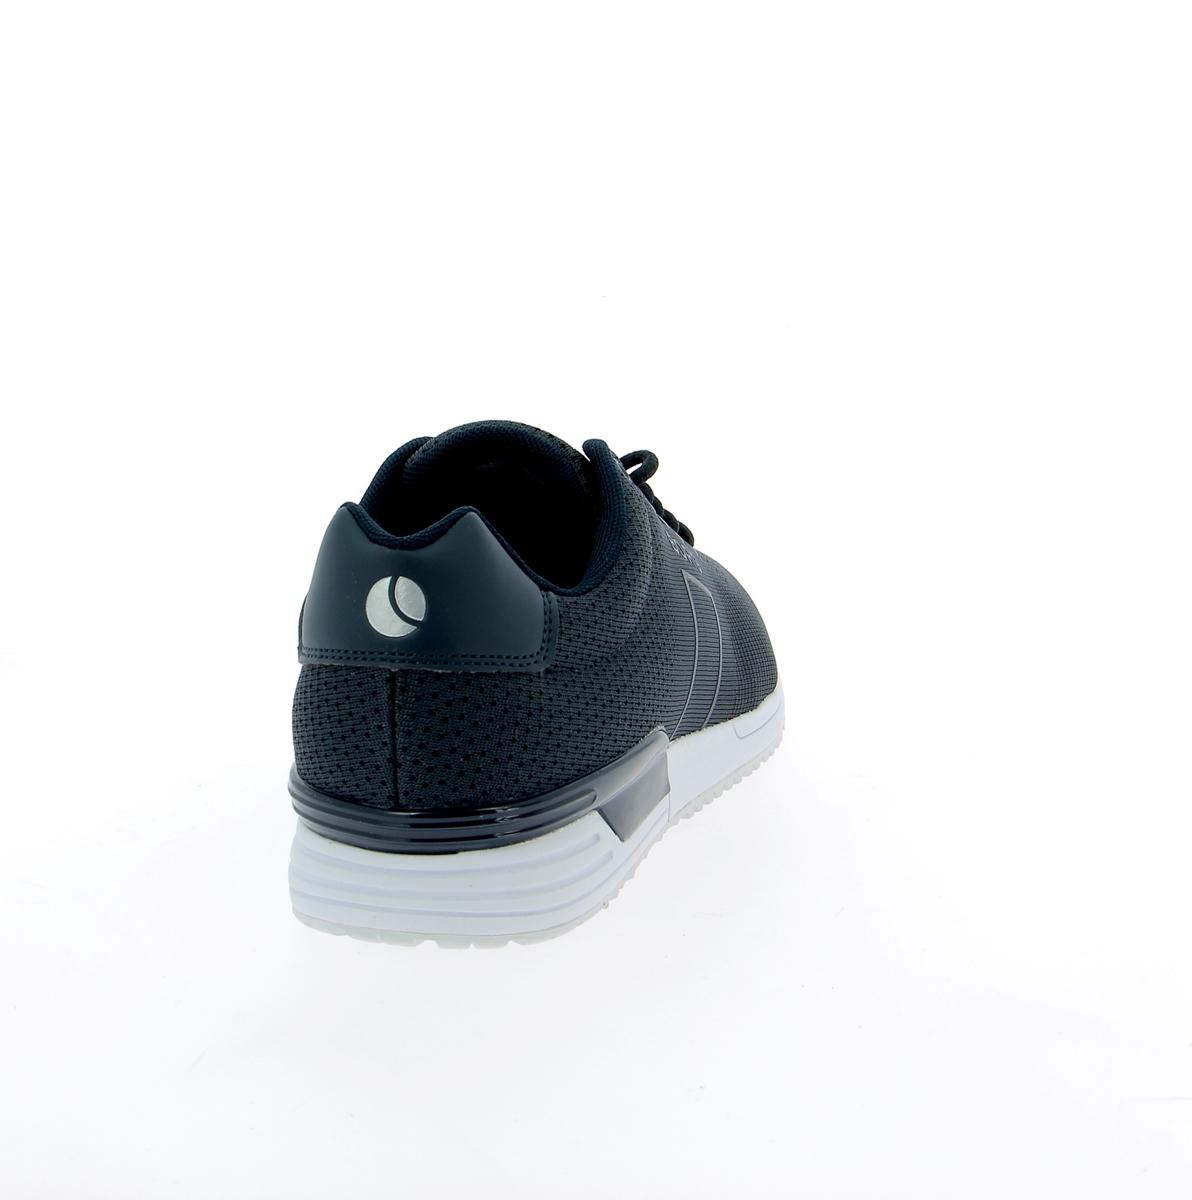 Bjorn Borg Basket bleu